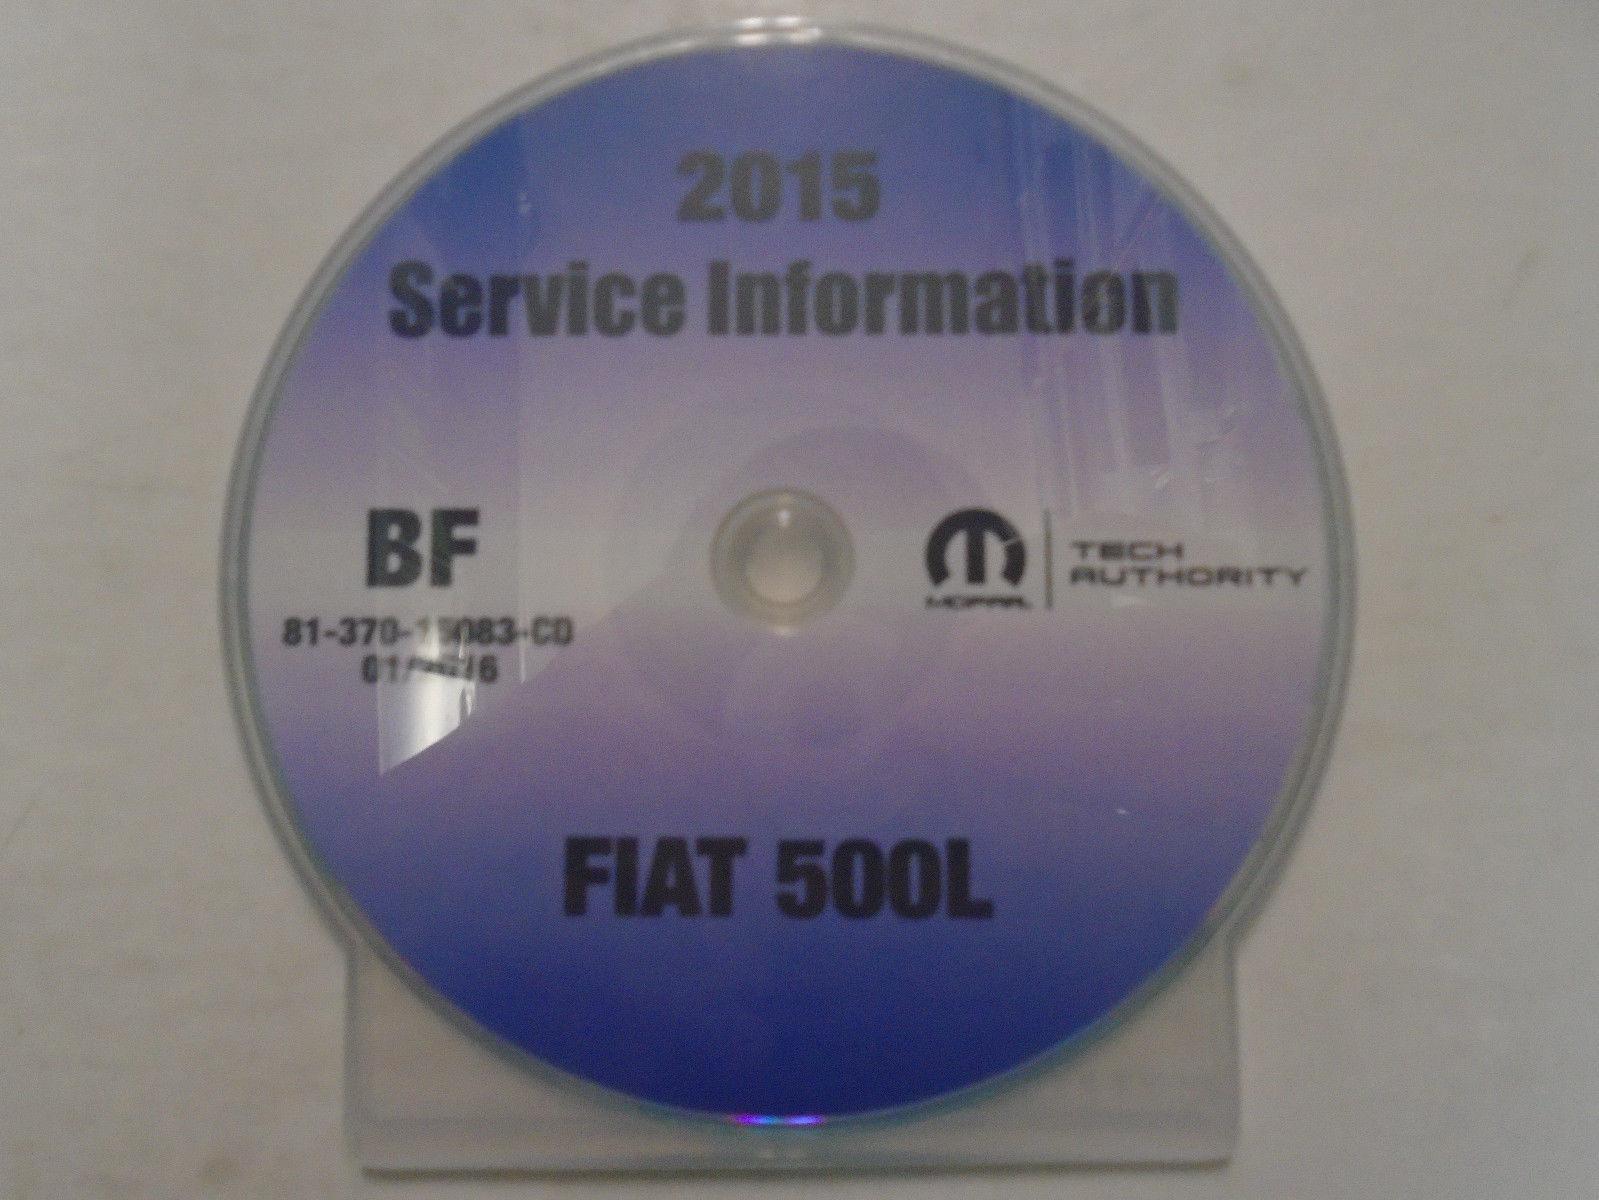 2015 fiat 500 l service information shop and 30 similar items rh bonanza com fiat 500 service manual pdf fiat 500l owner's manual